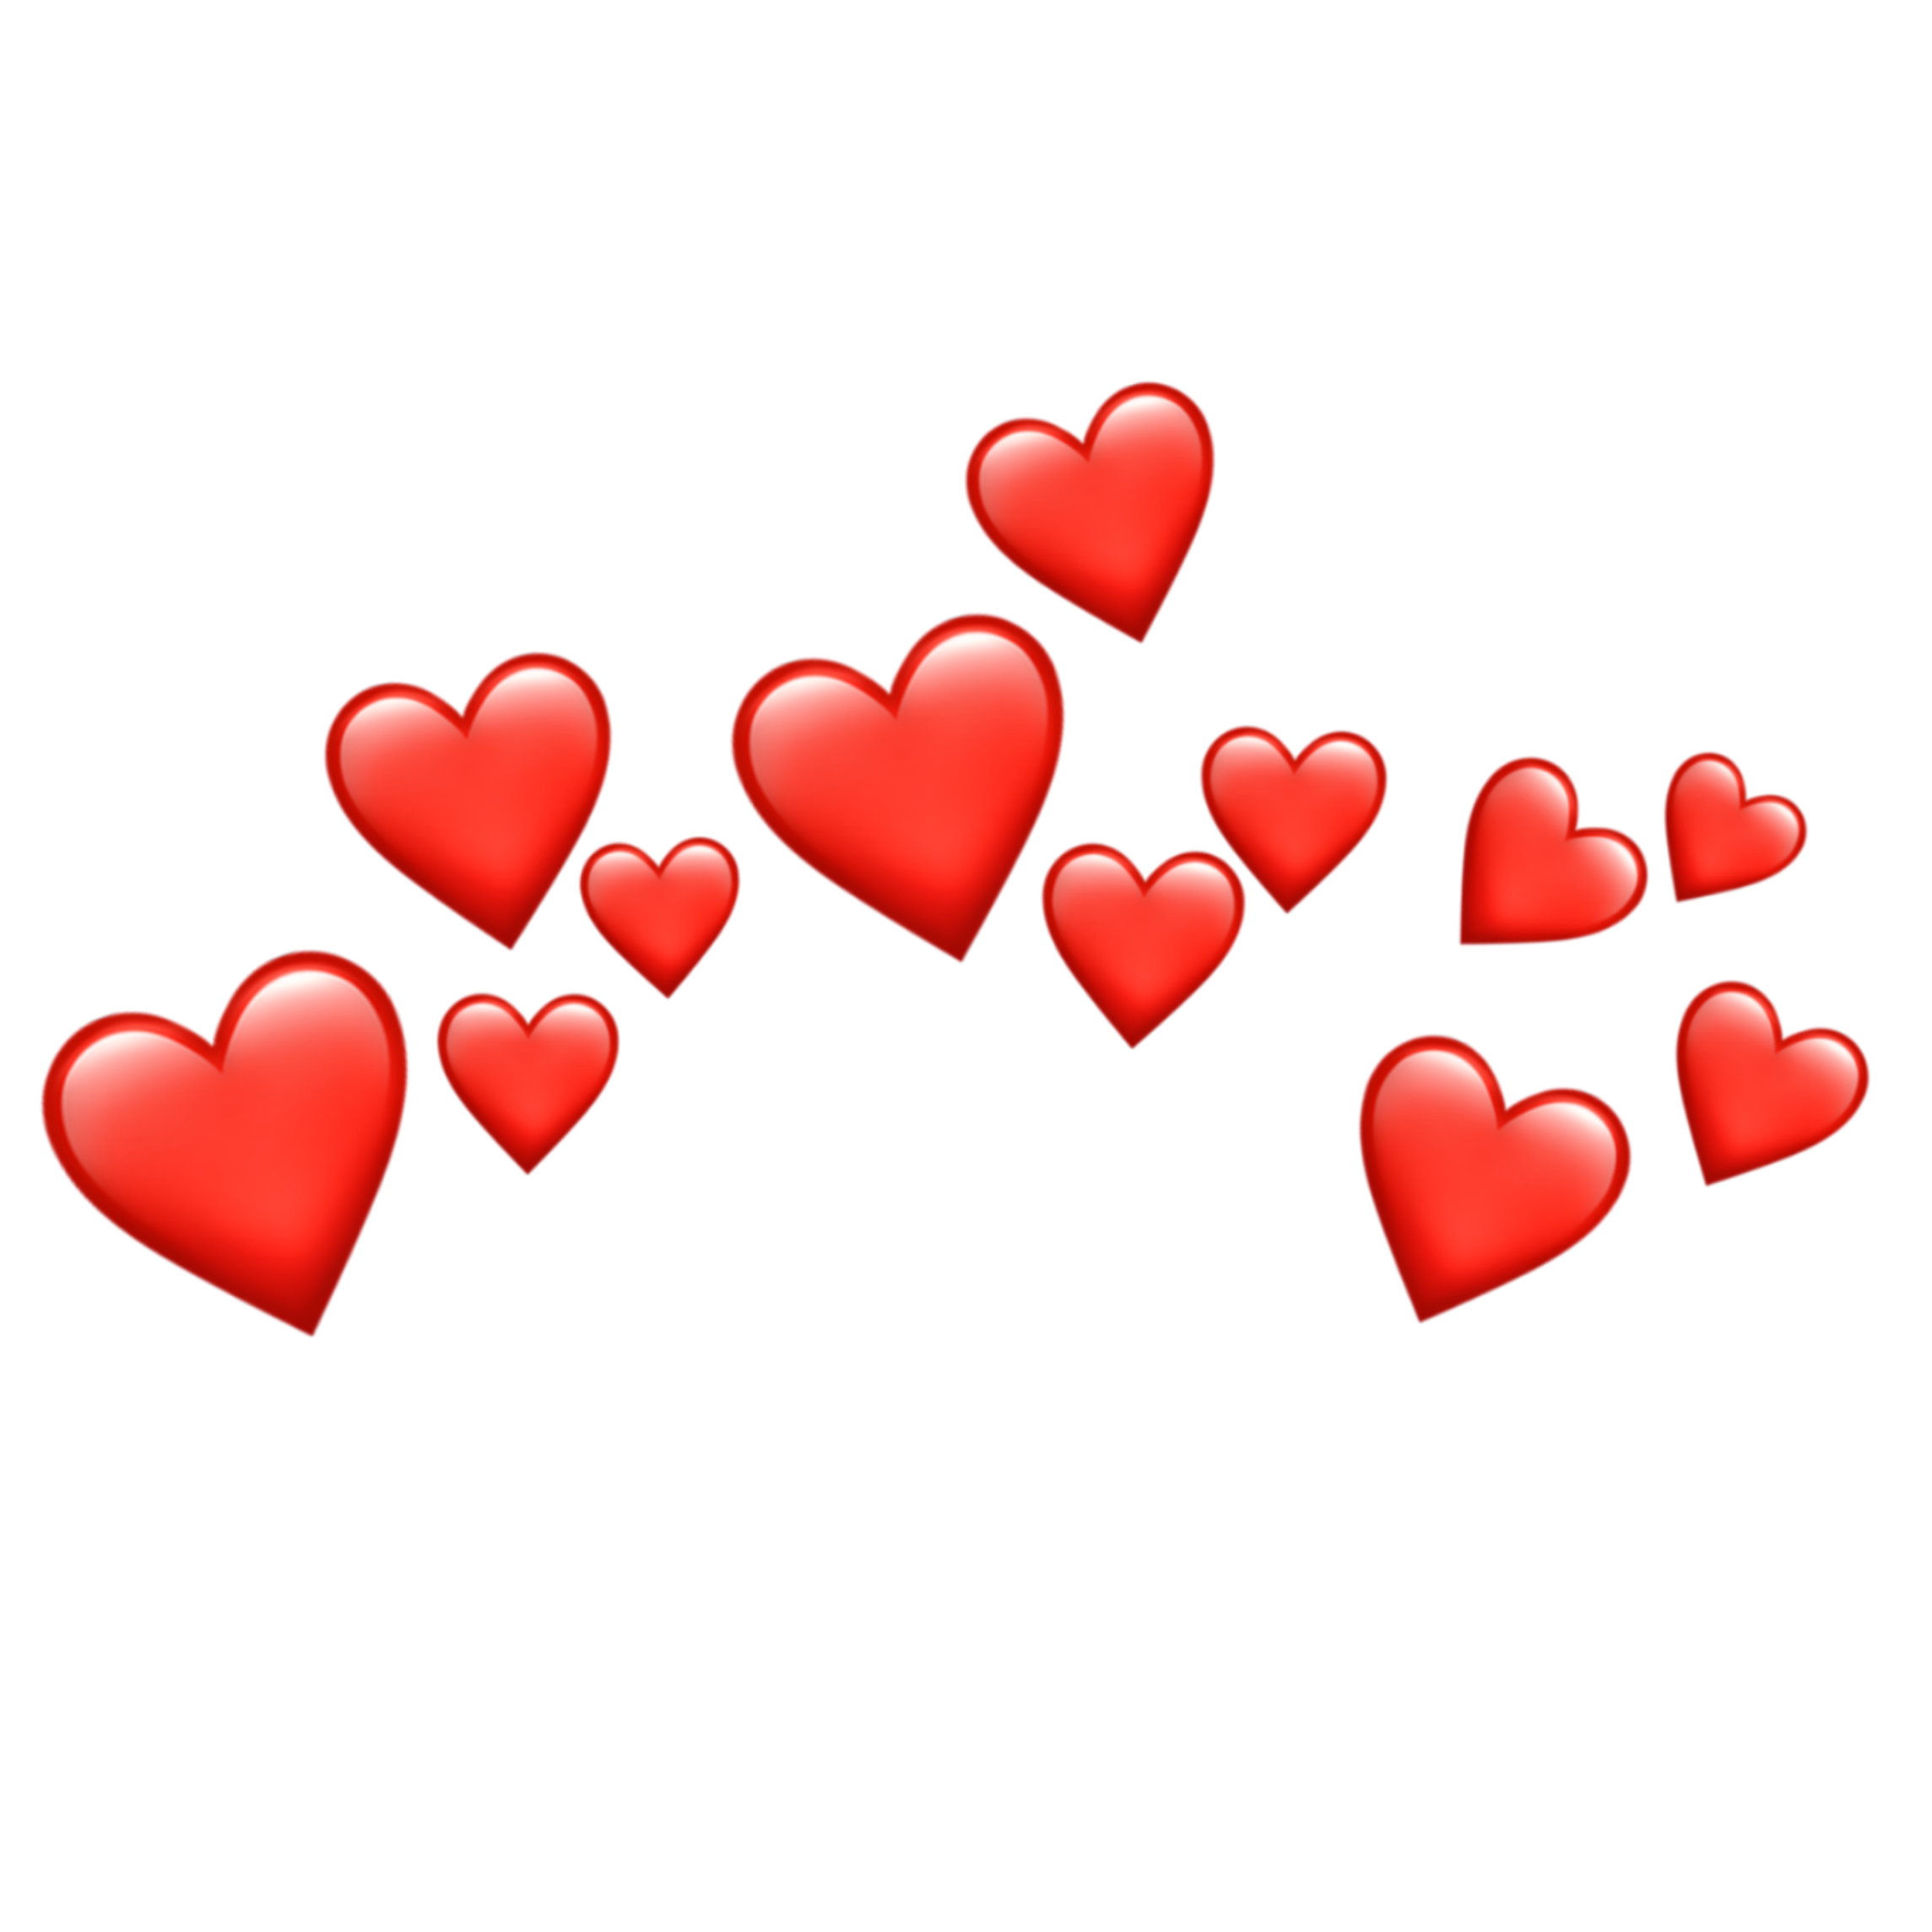 emoji crown heart picsart sticker coeur aesthetic hearts coroa transparent iphone flower snapchat meme filter stickers coracao pink background emojis